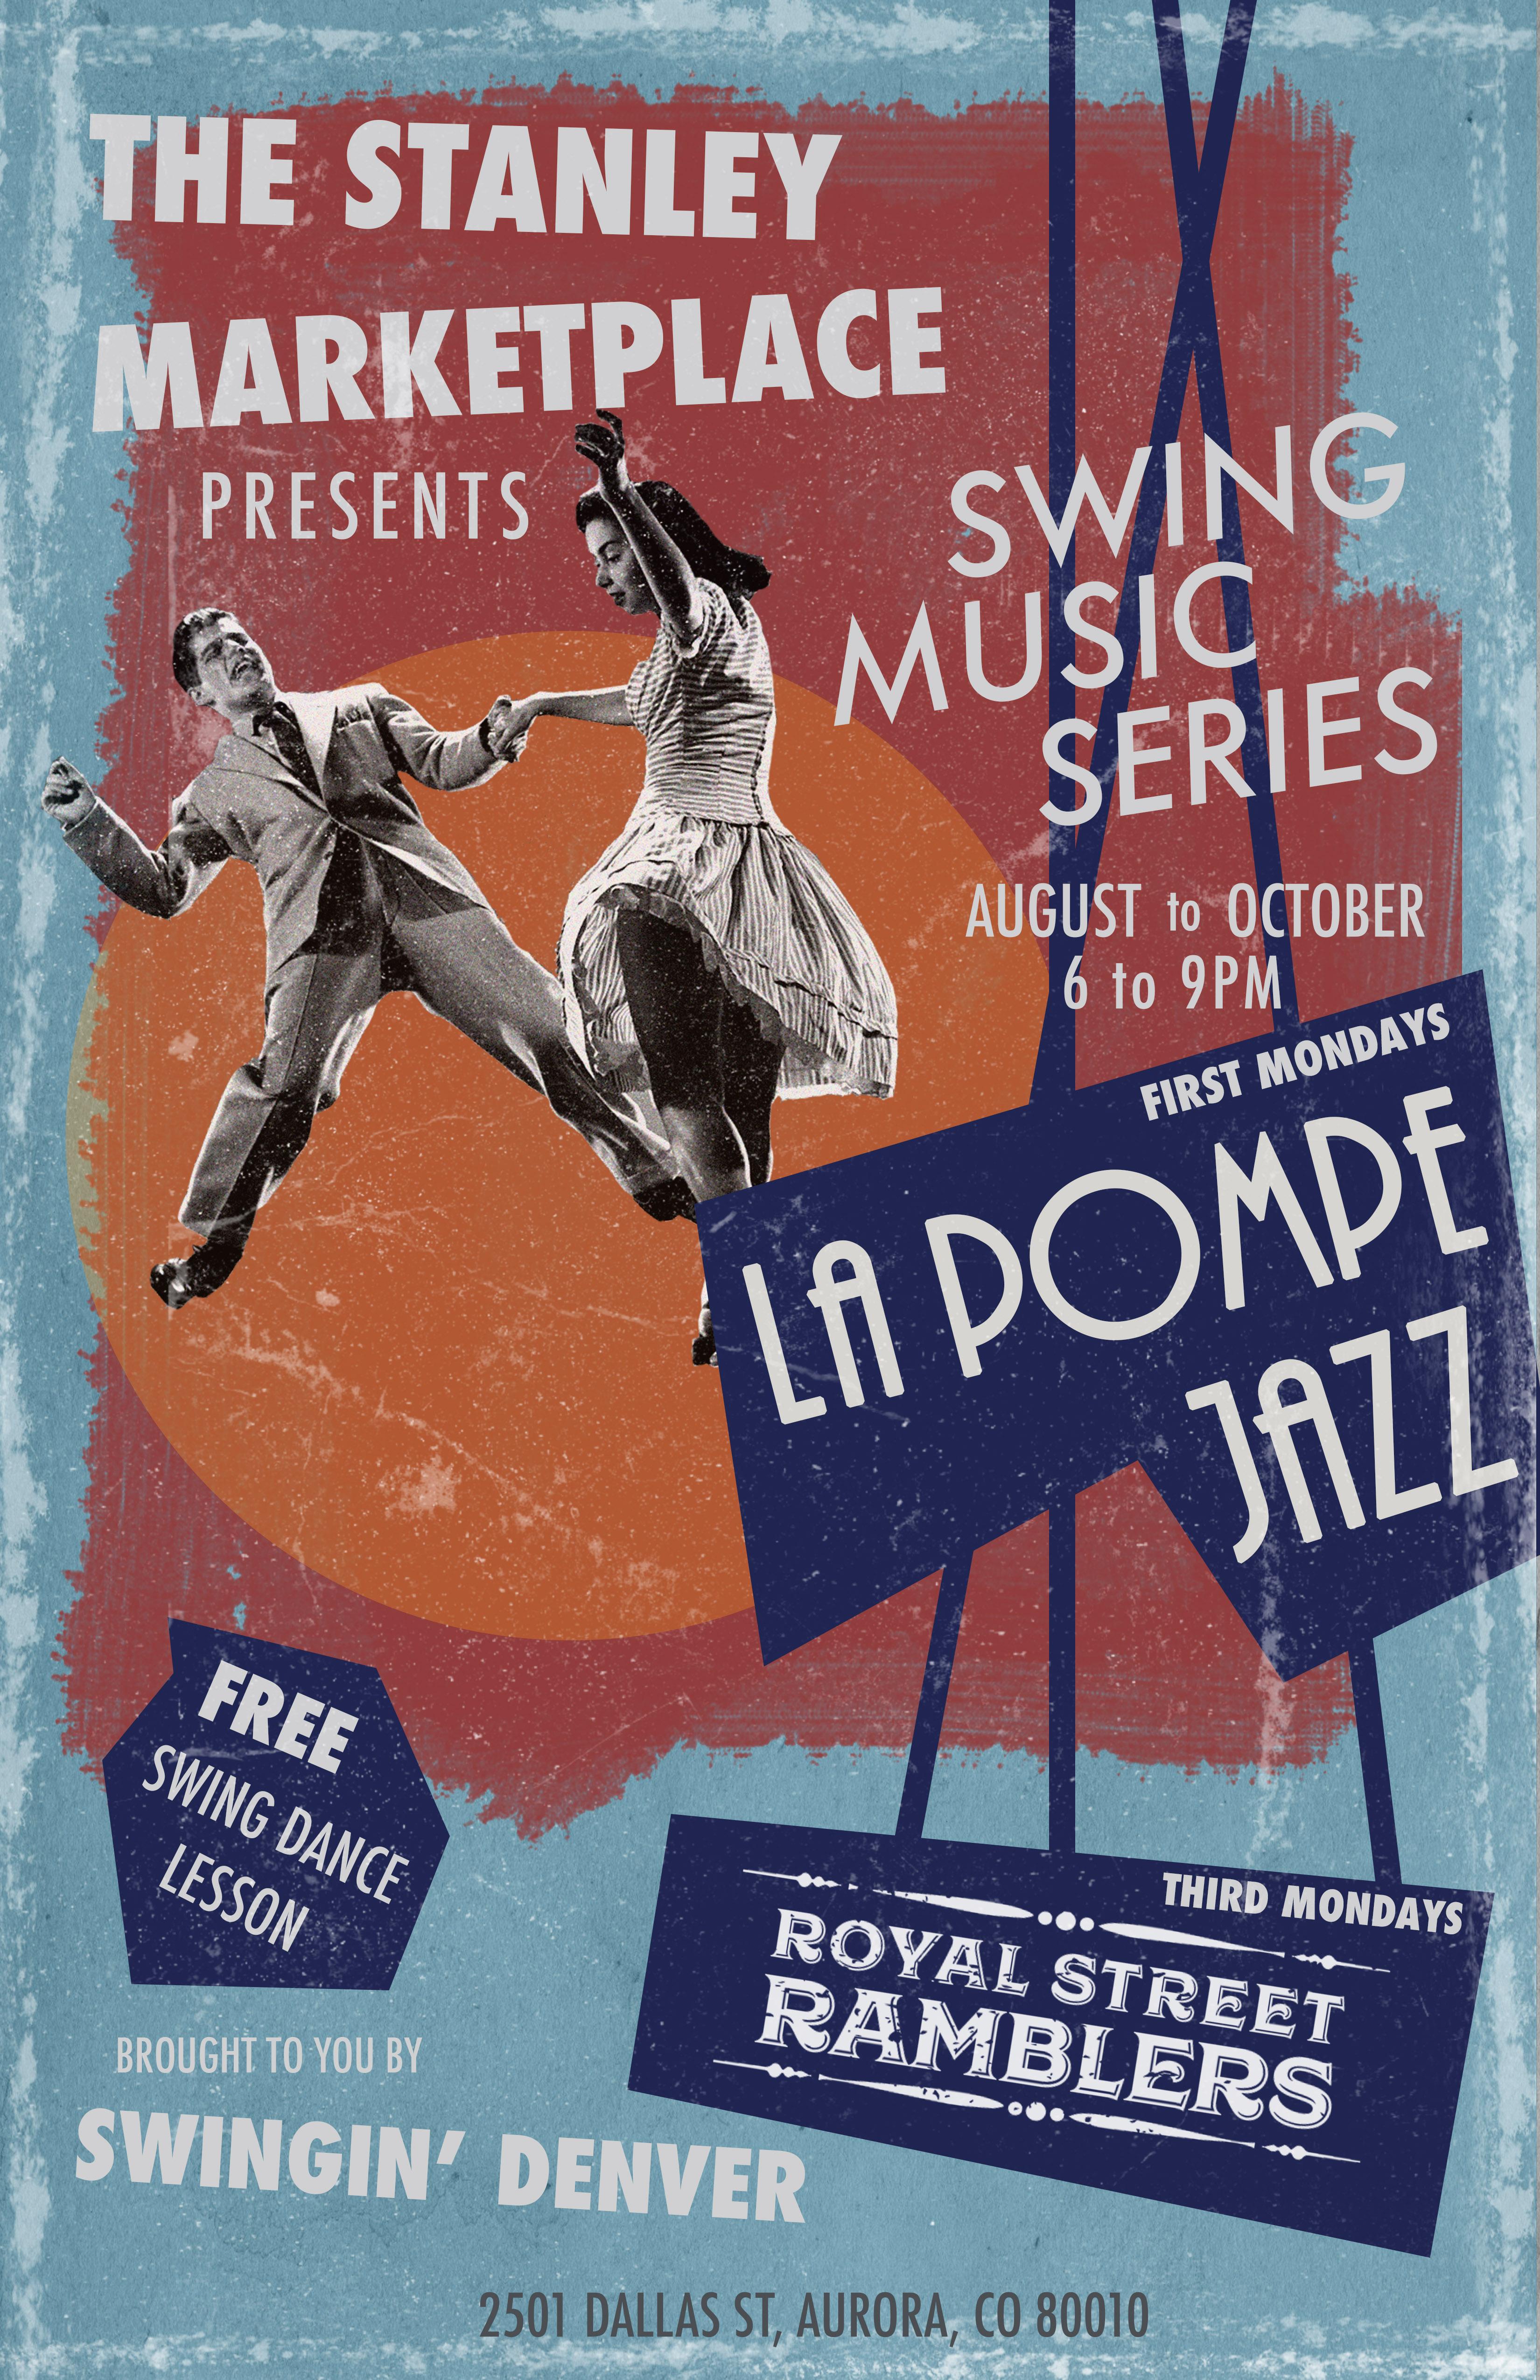 La Pompe Jazz Poster